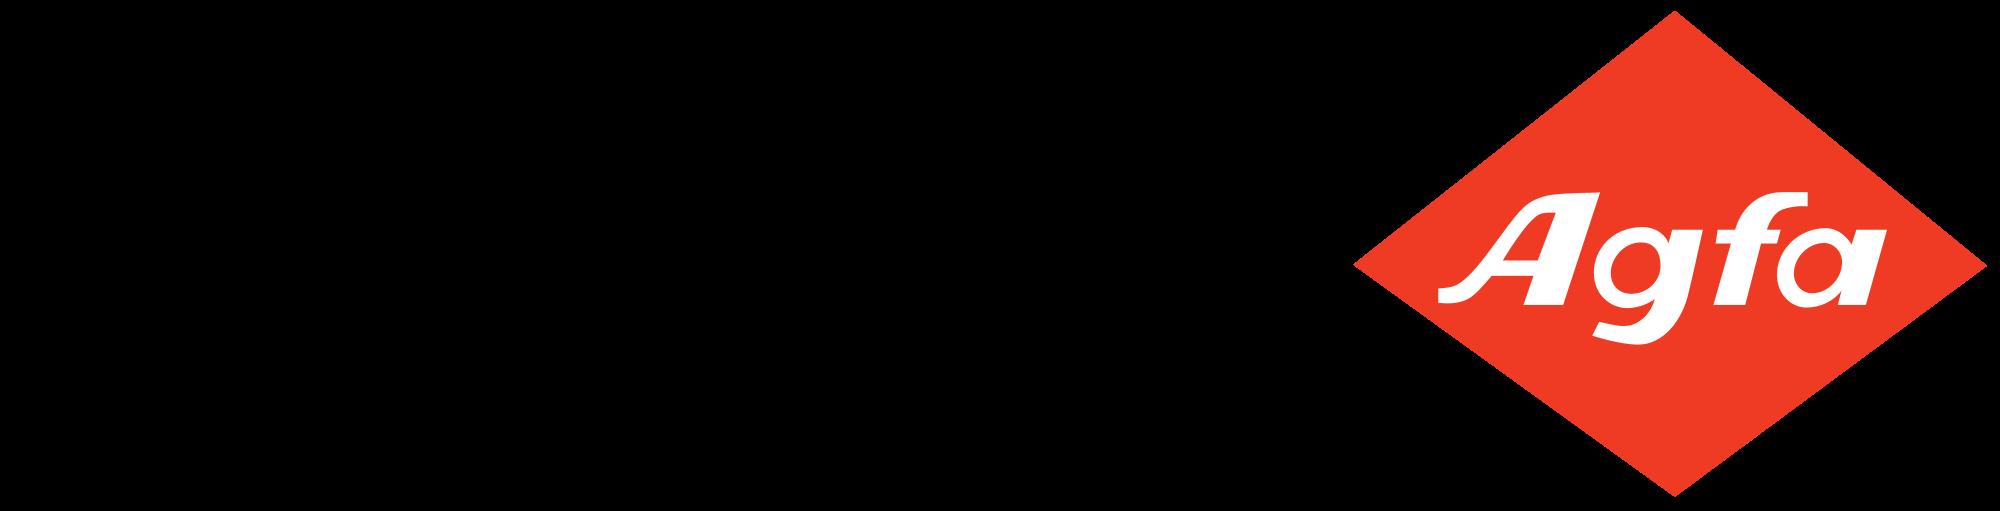 2000px-Agfa_logo.png